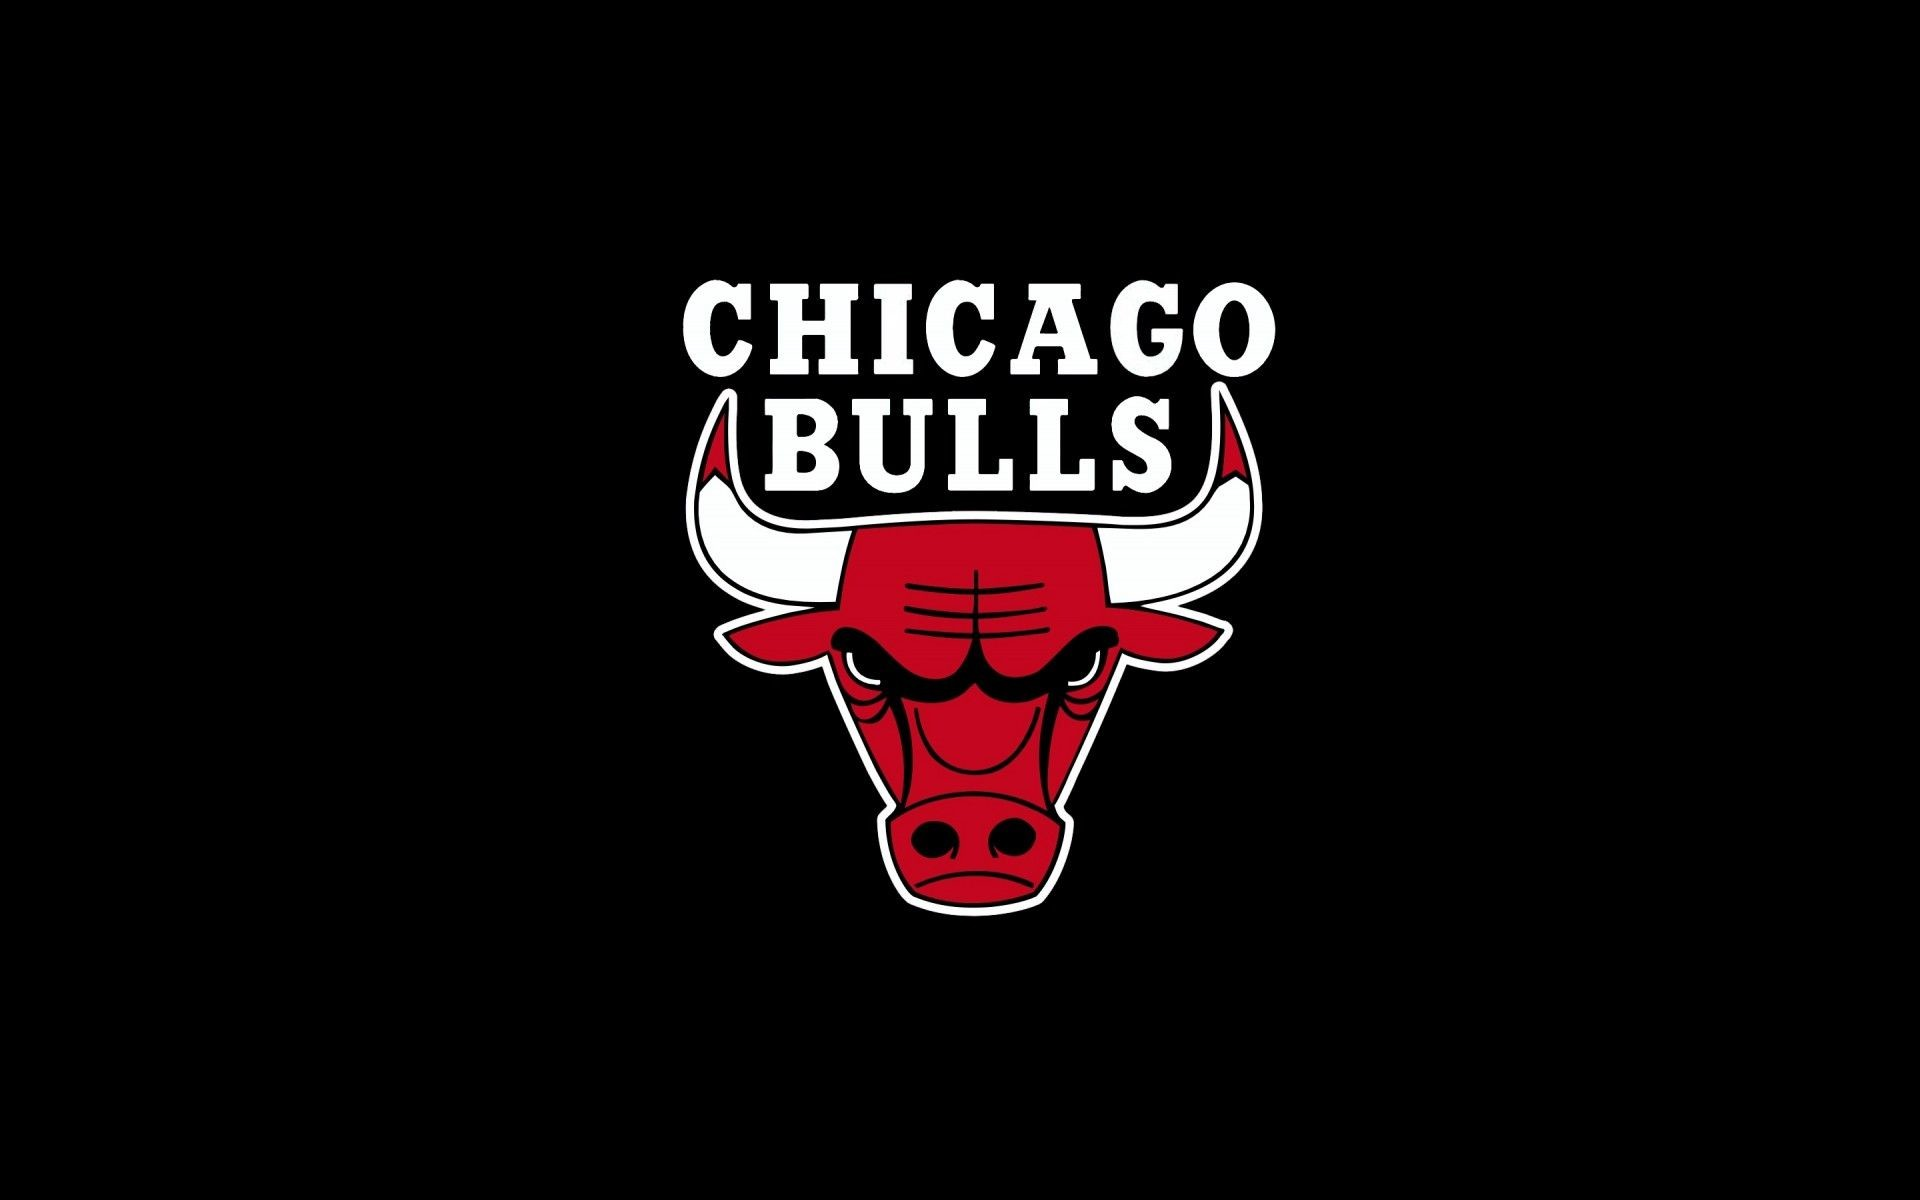 Chicago Bulls, nba, logo, sports, black background Image Wallpaper